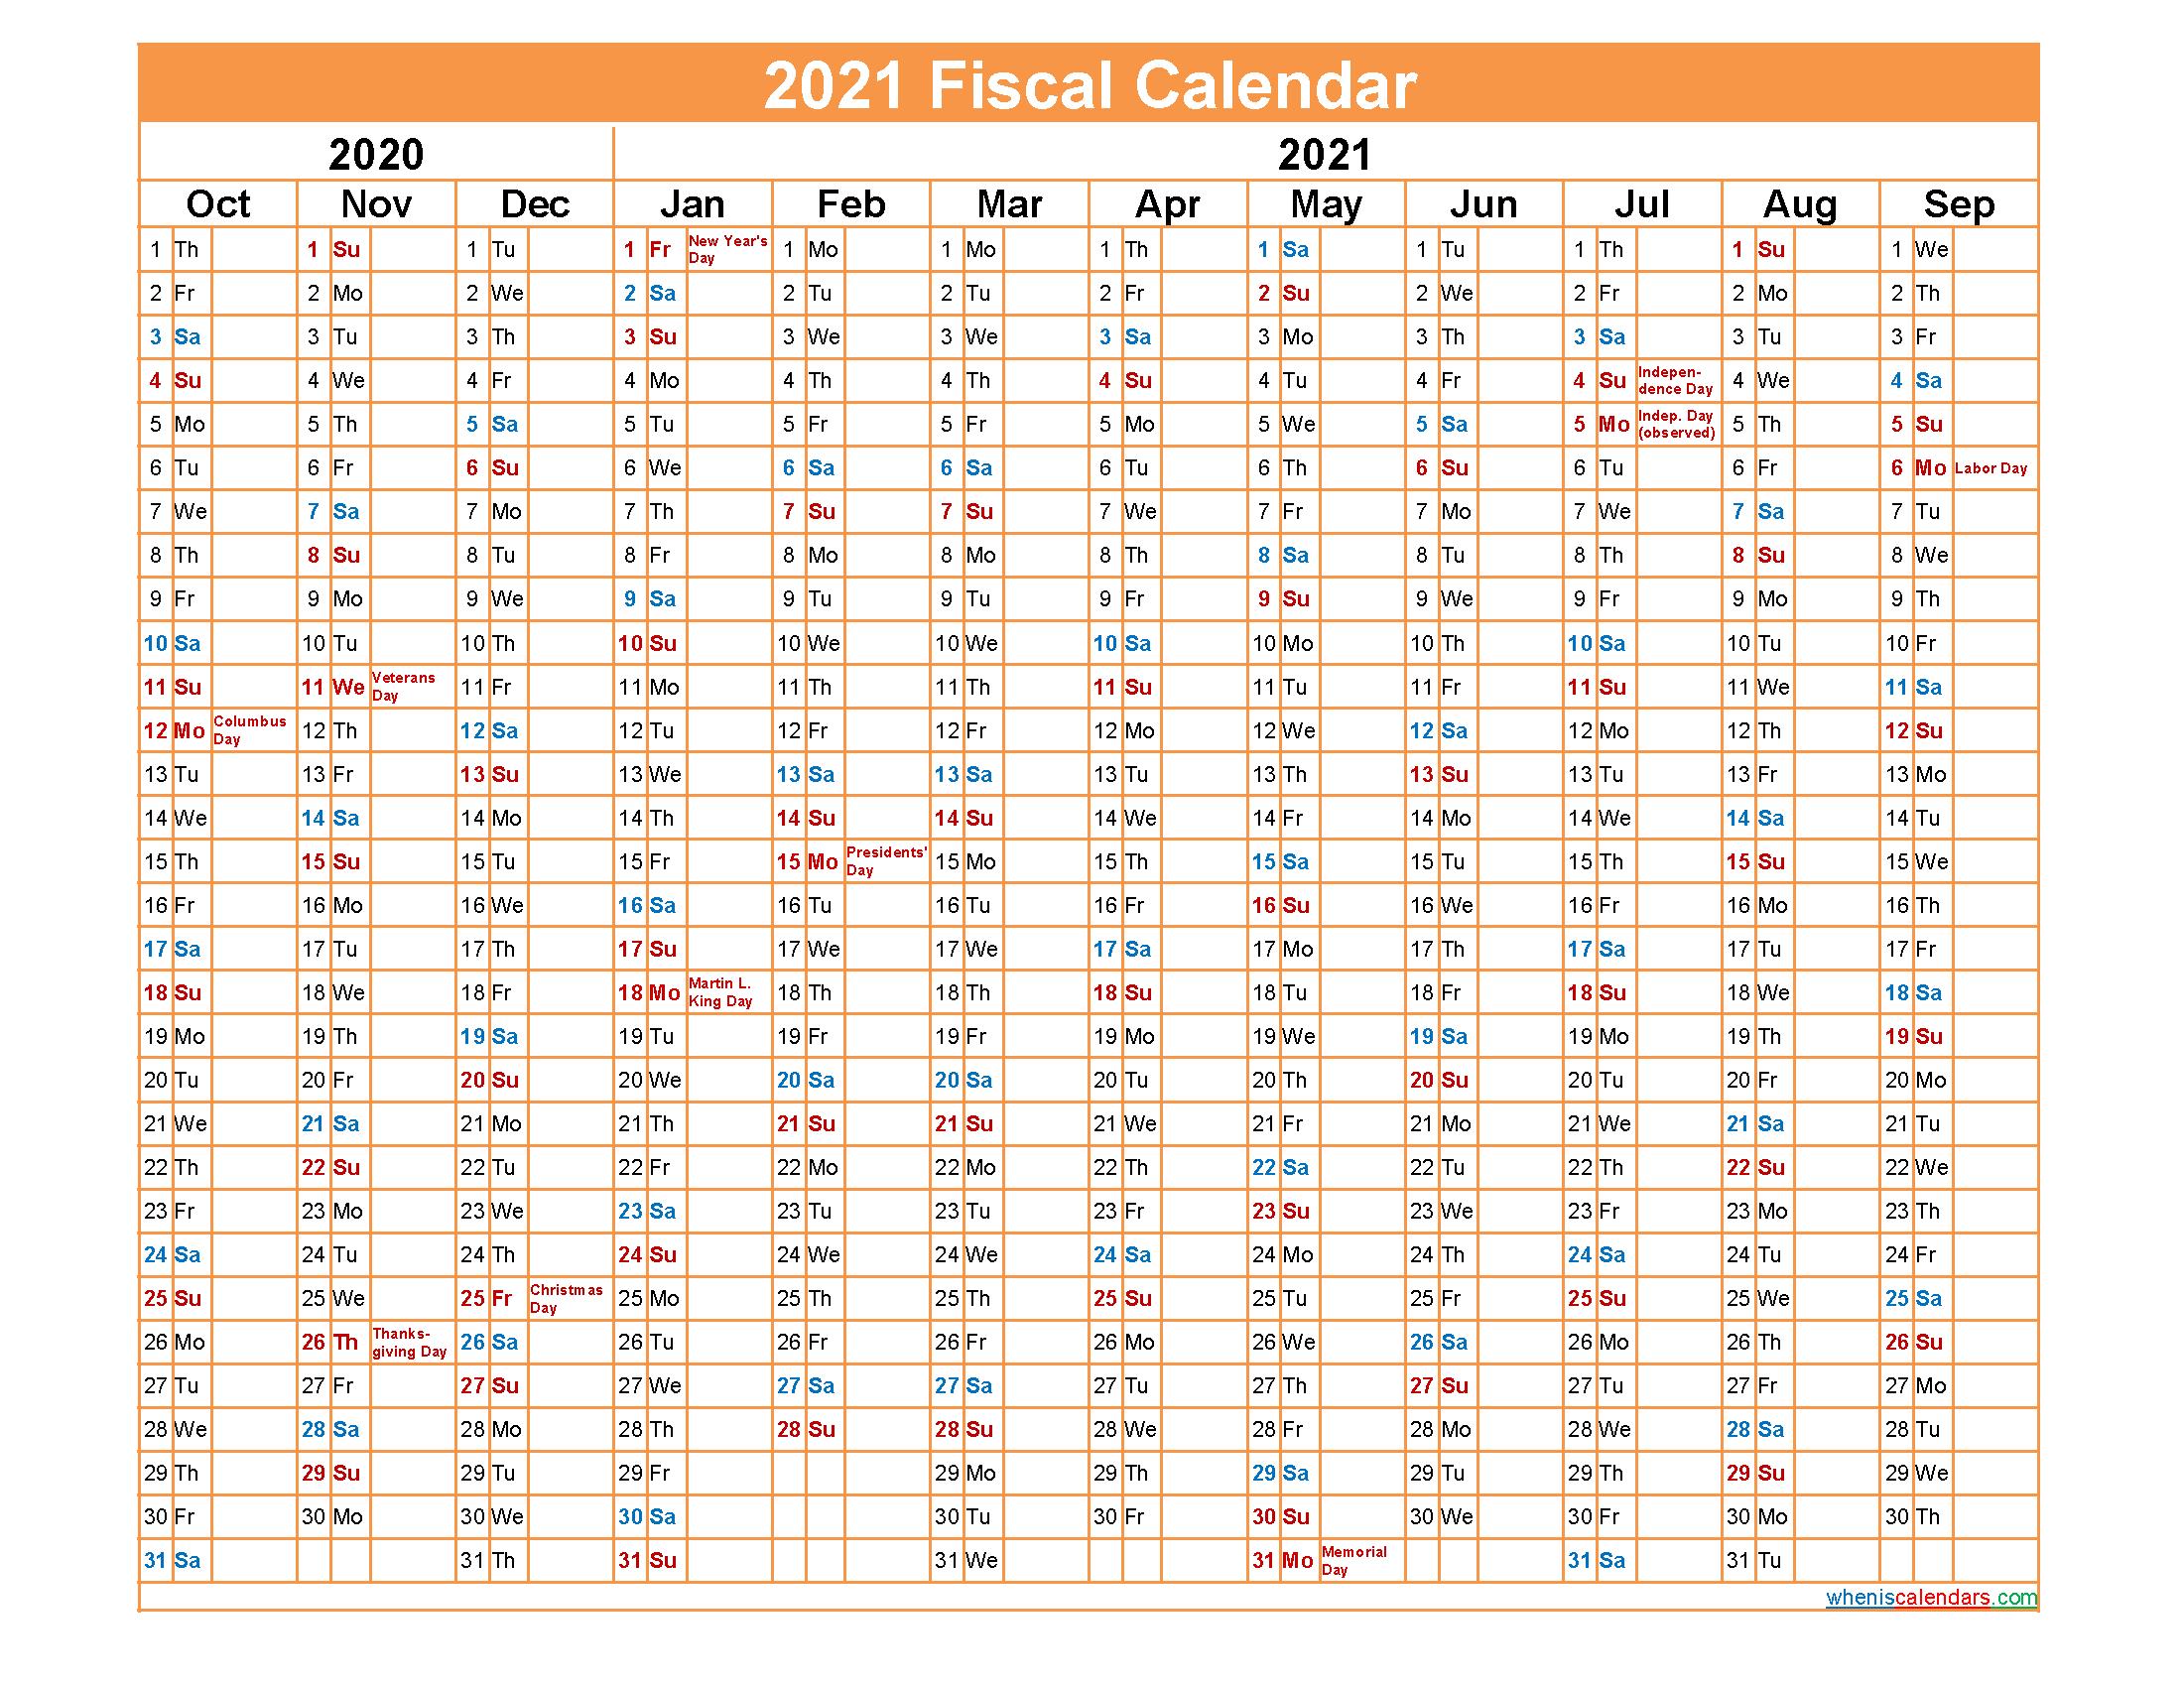 Fiscal Year 2021 Calendar